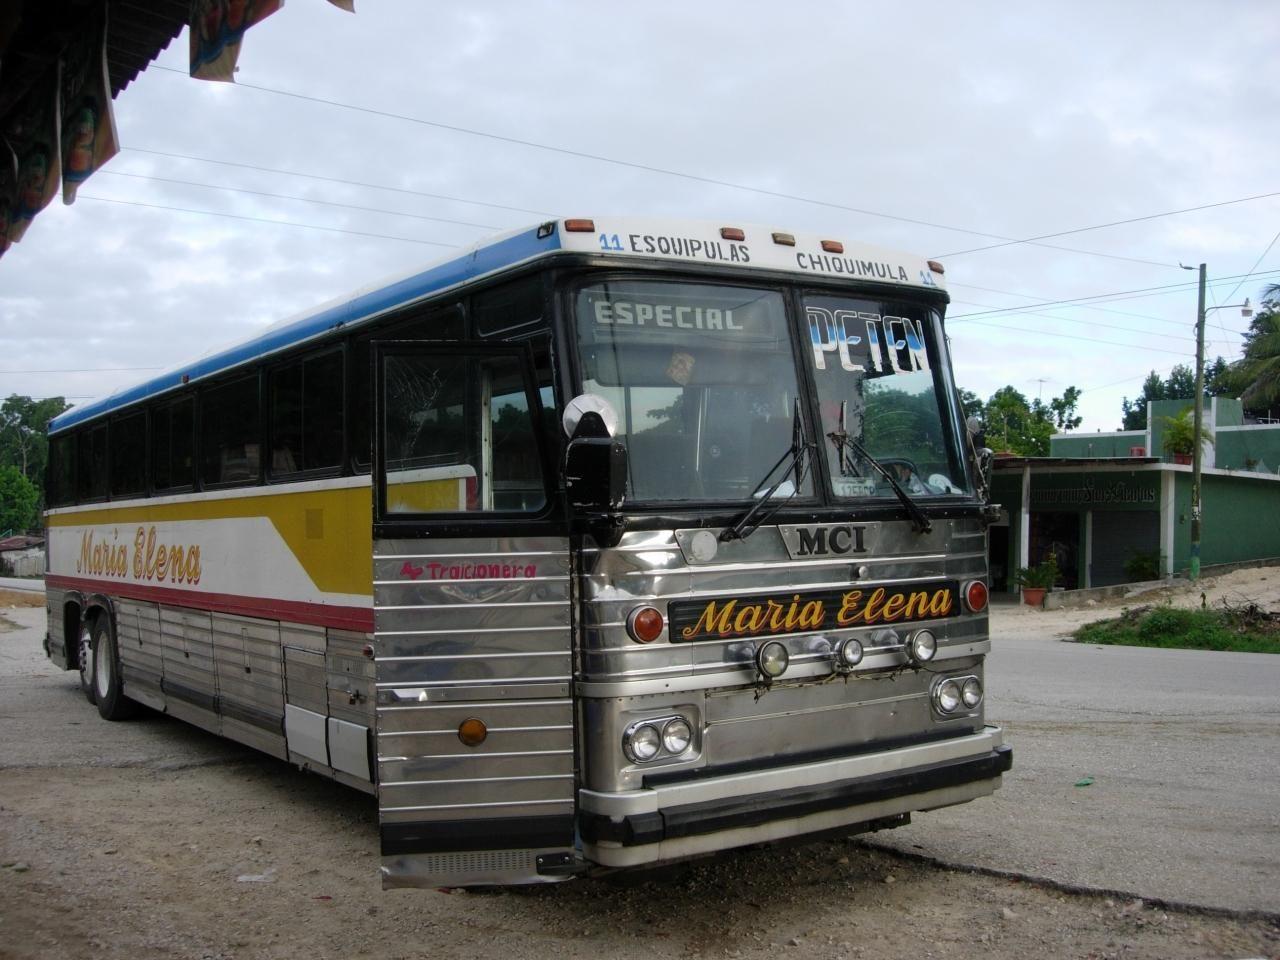 Transportes Maria Elena MCI MC-9   Ex-Greyhound type (MCI) buses in